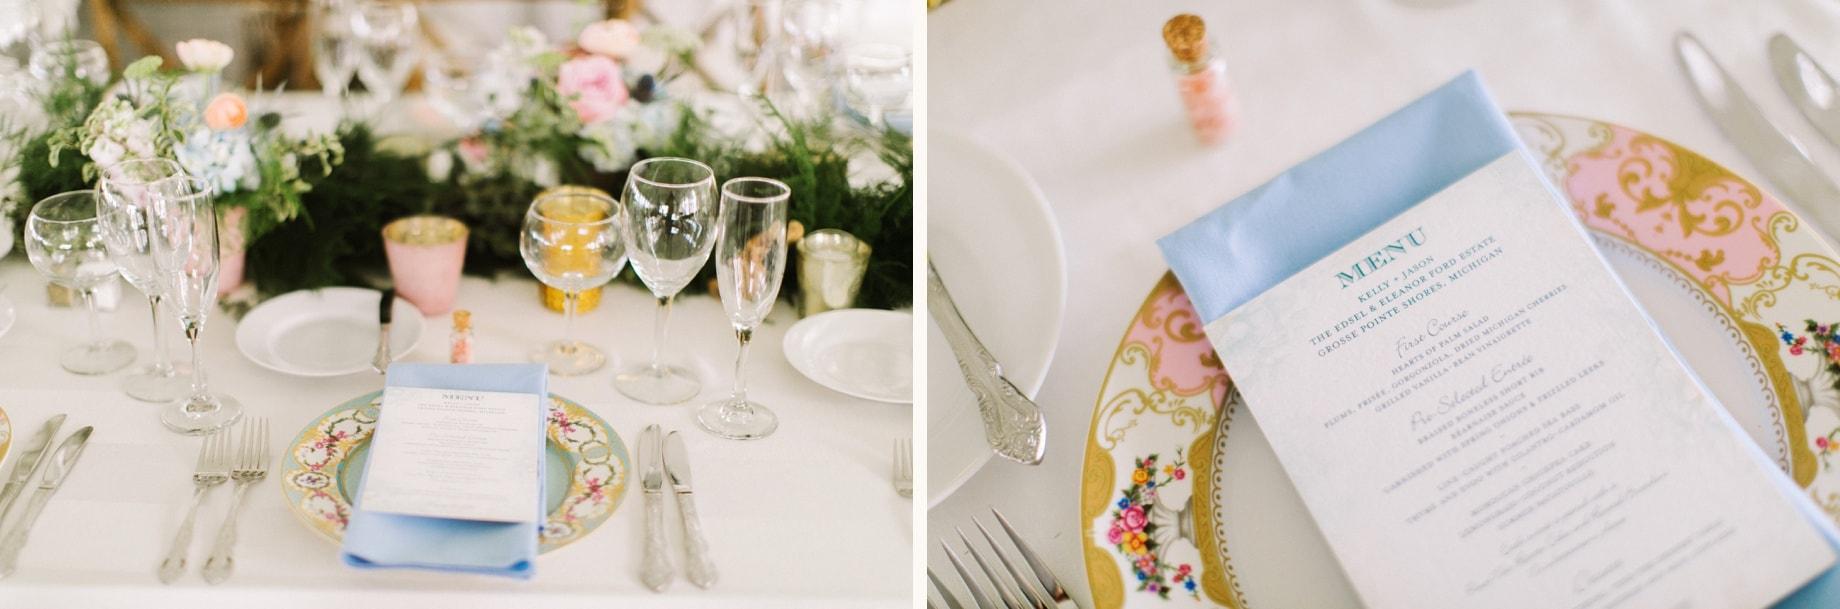 classic wedding details